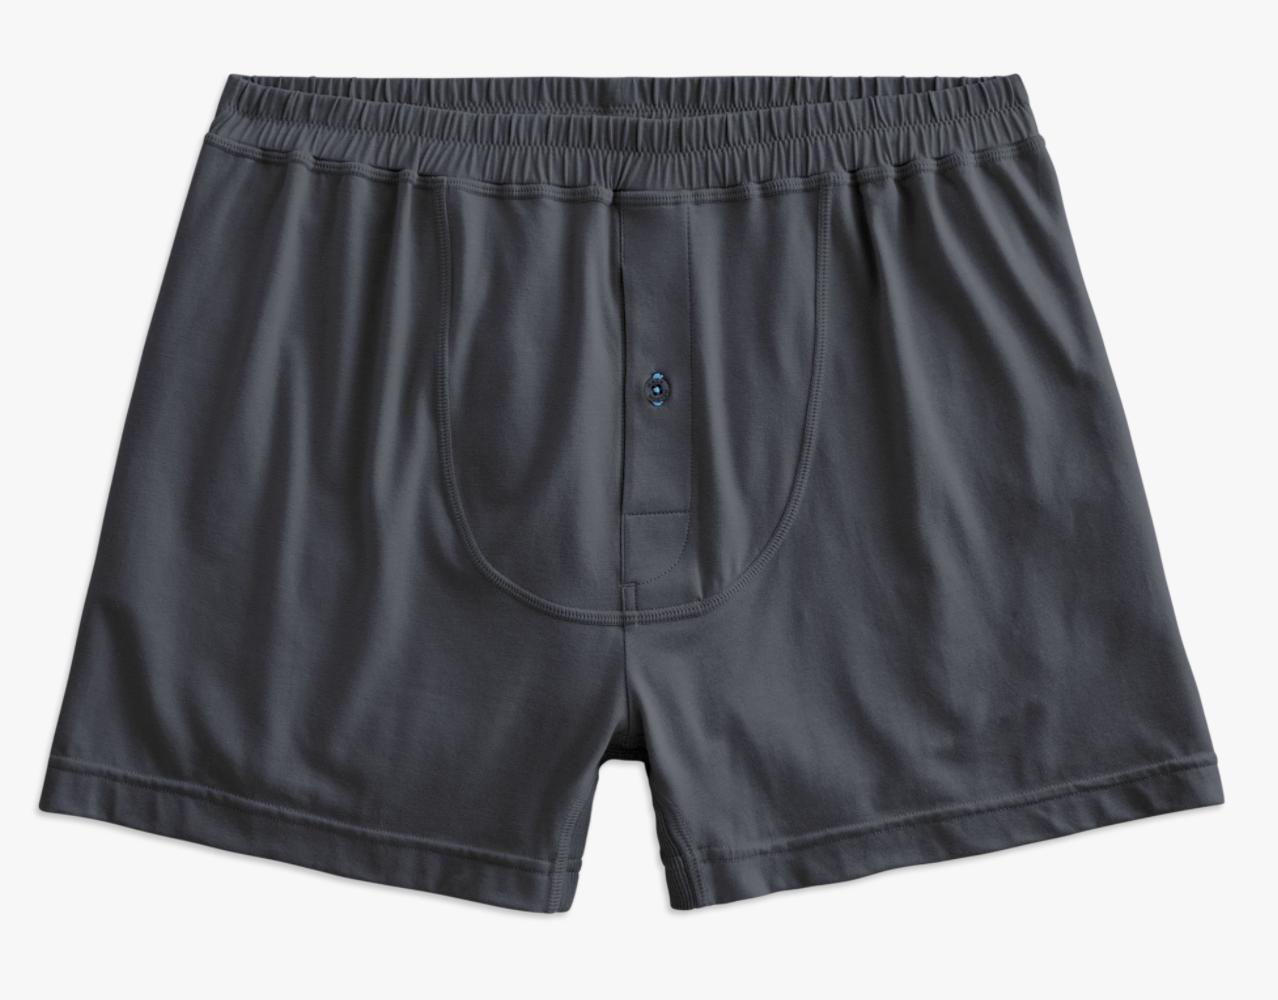 boxers underwear mens mack weldon